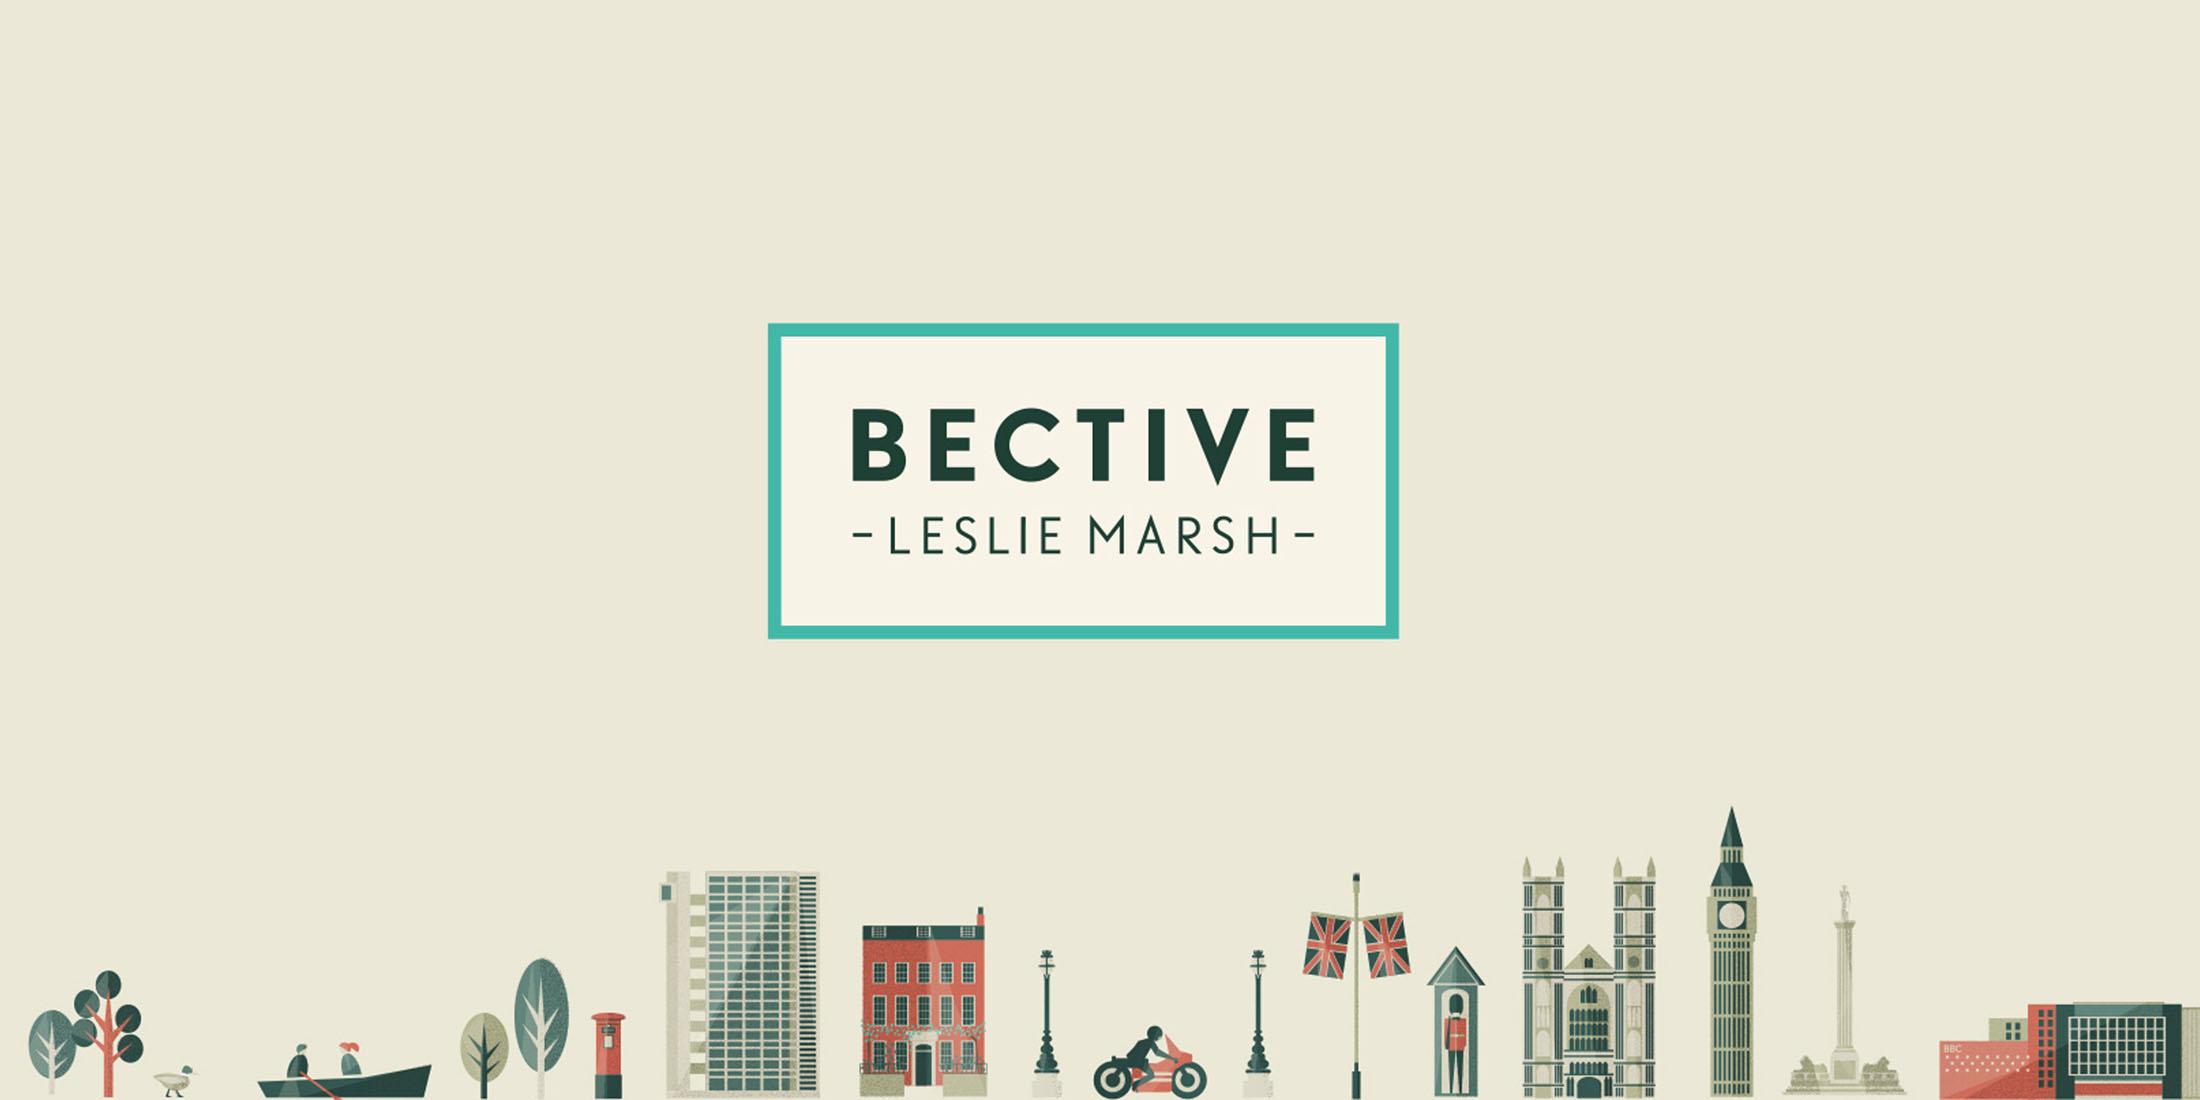 Bective logo